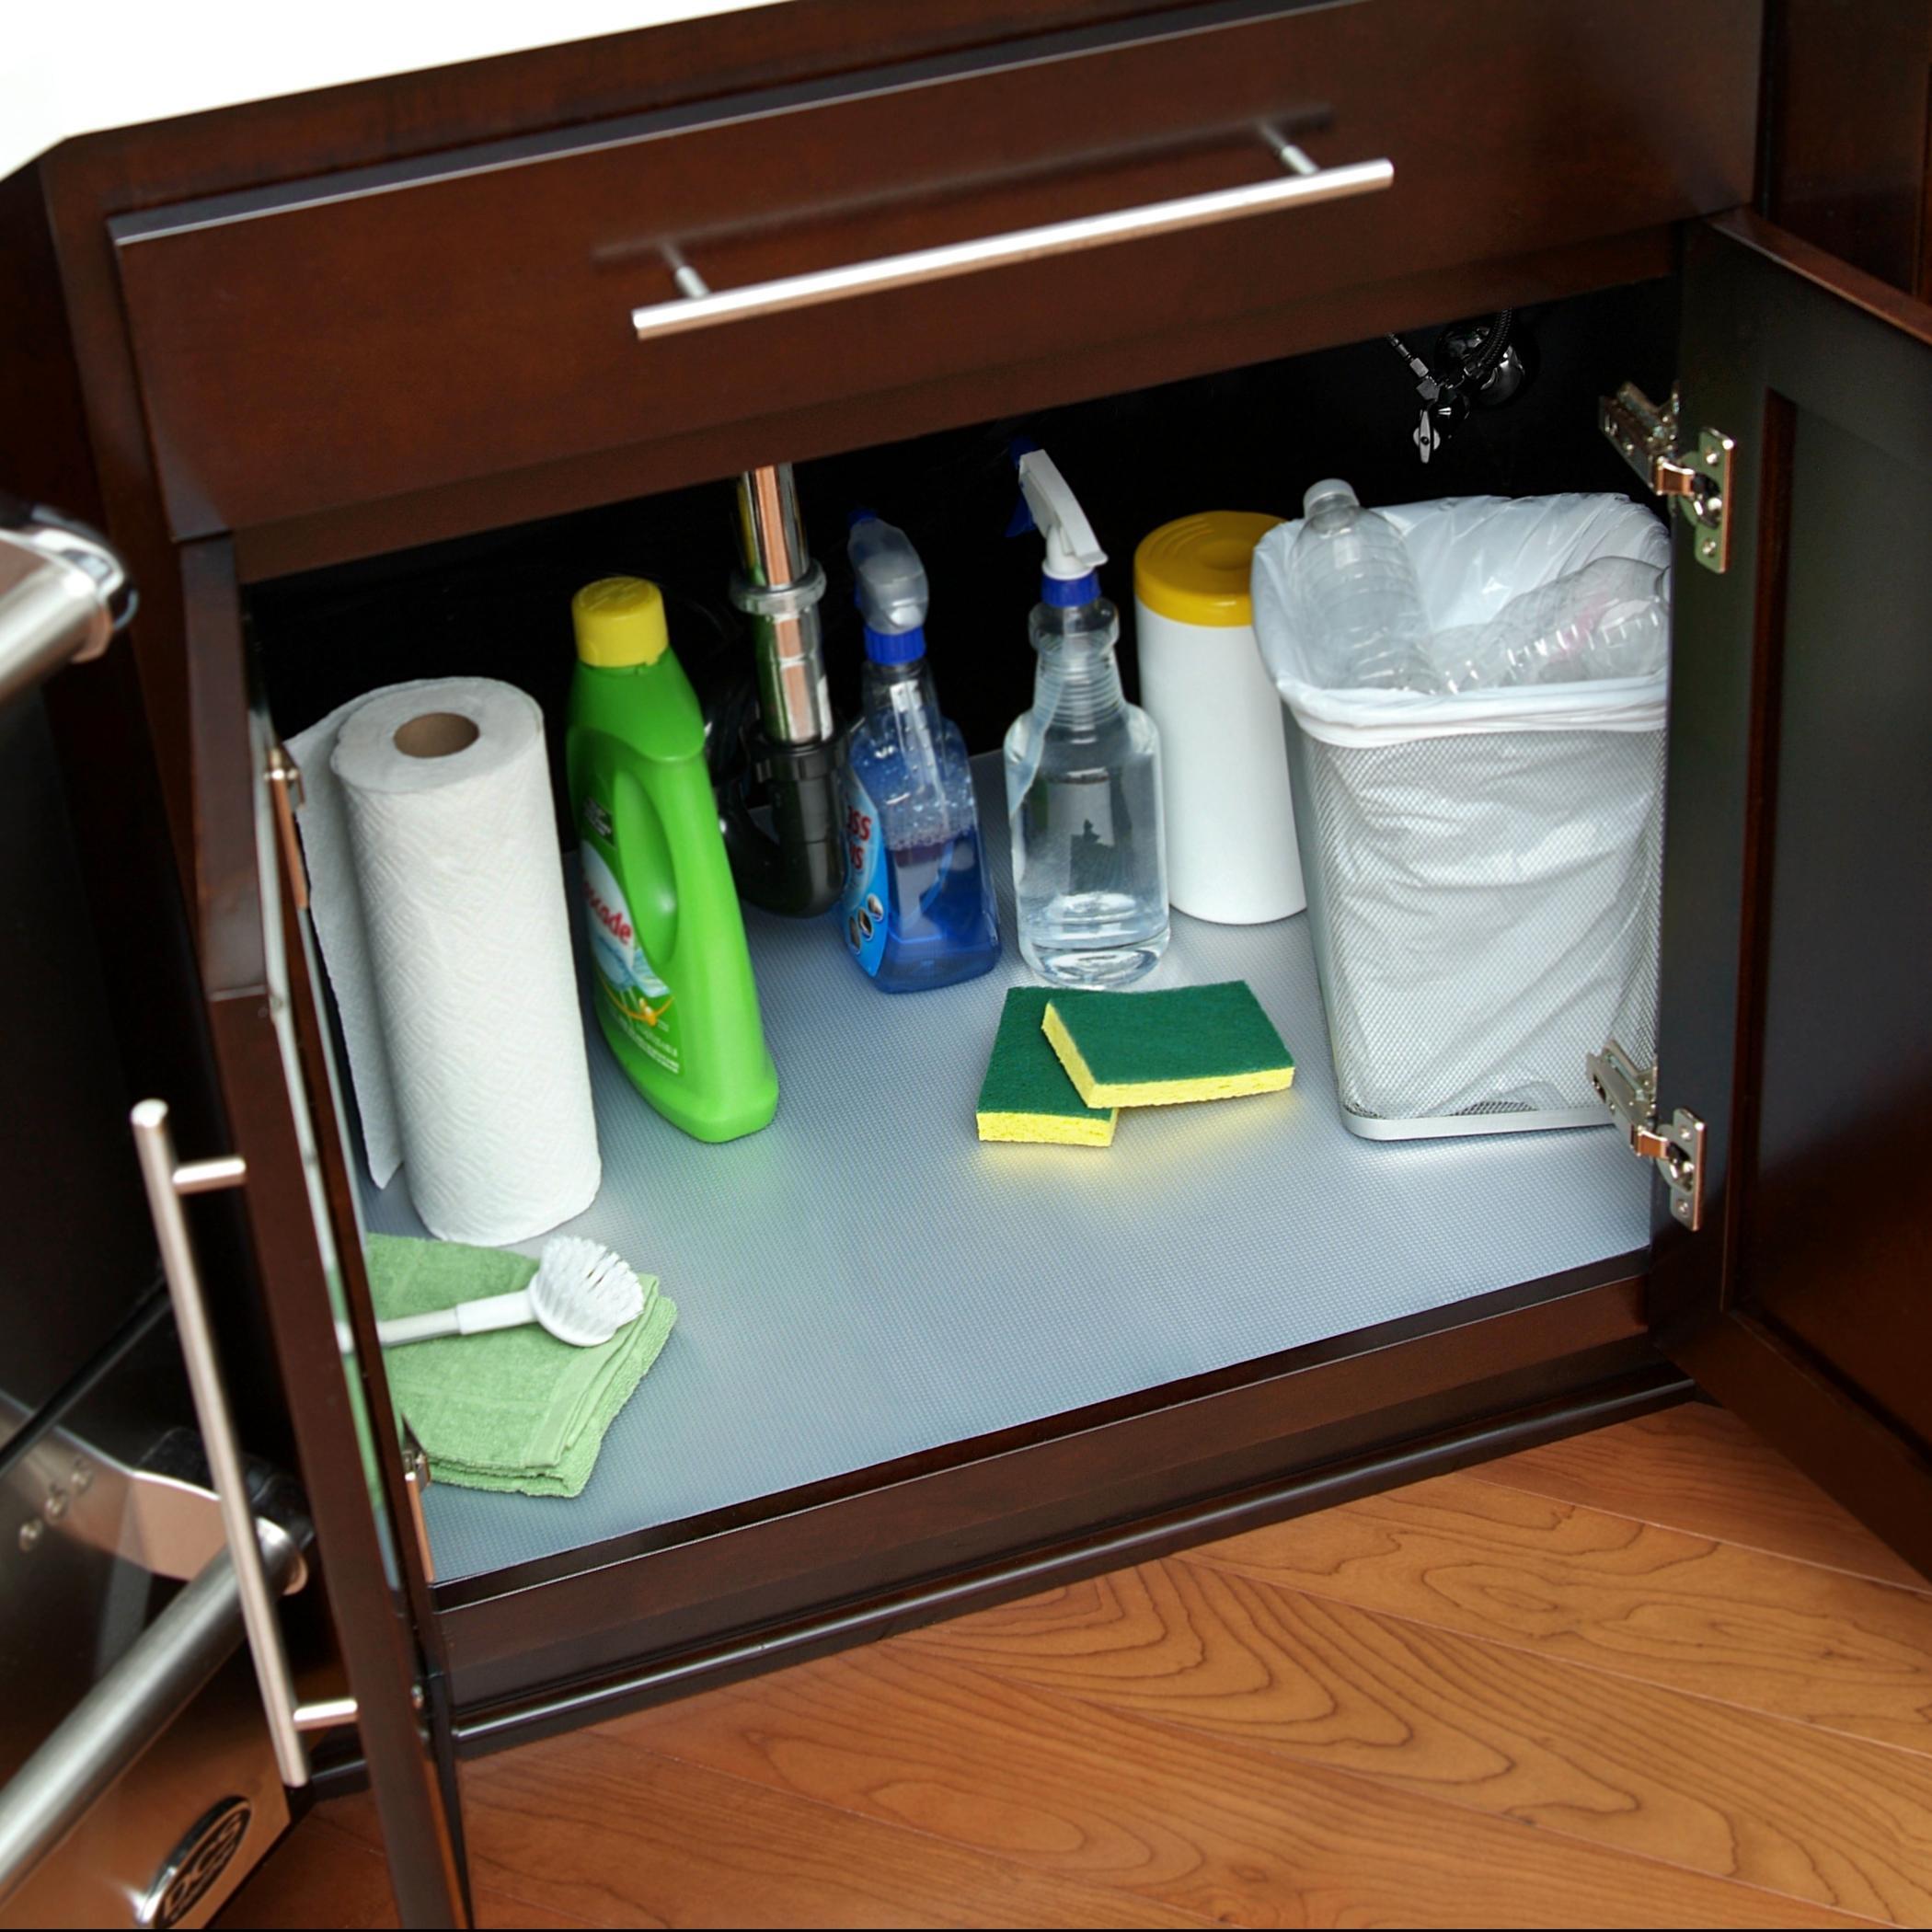 Kitchen Shelf Liner Reviews: Con-Tact Brand Under Sink Mat